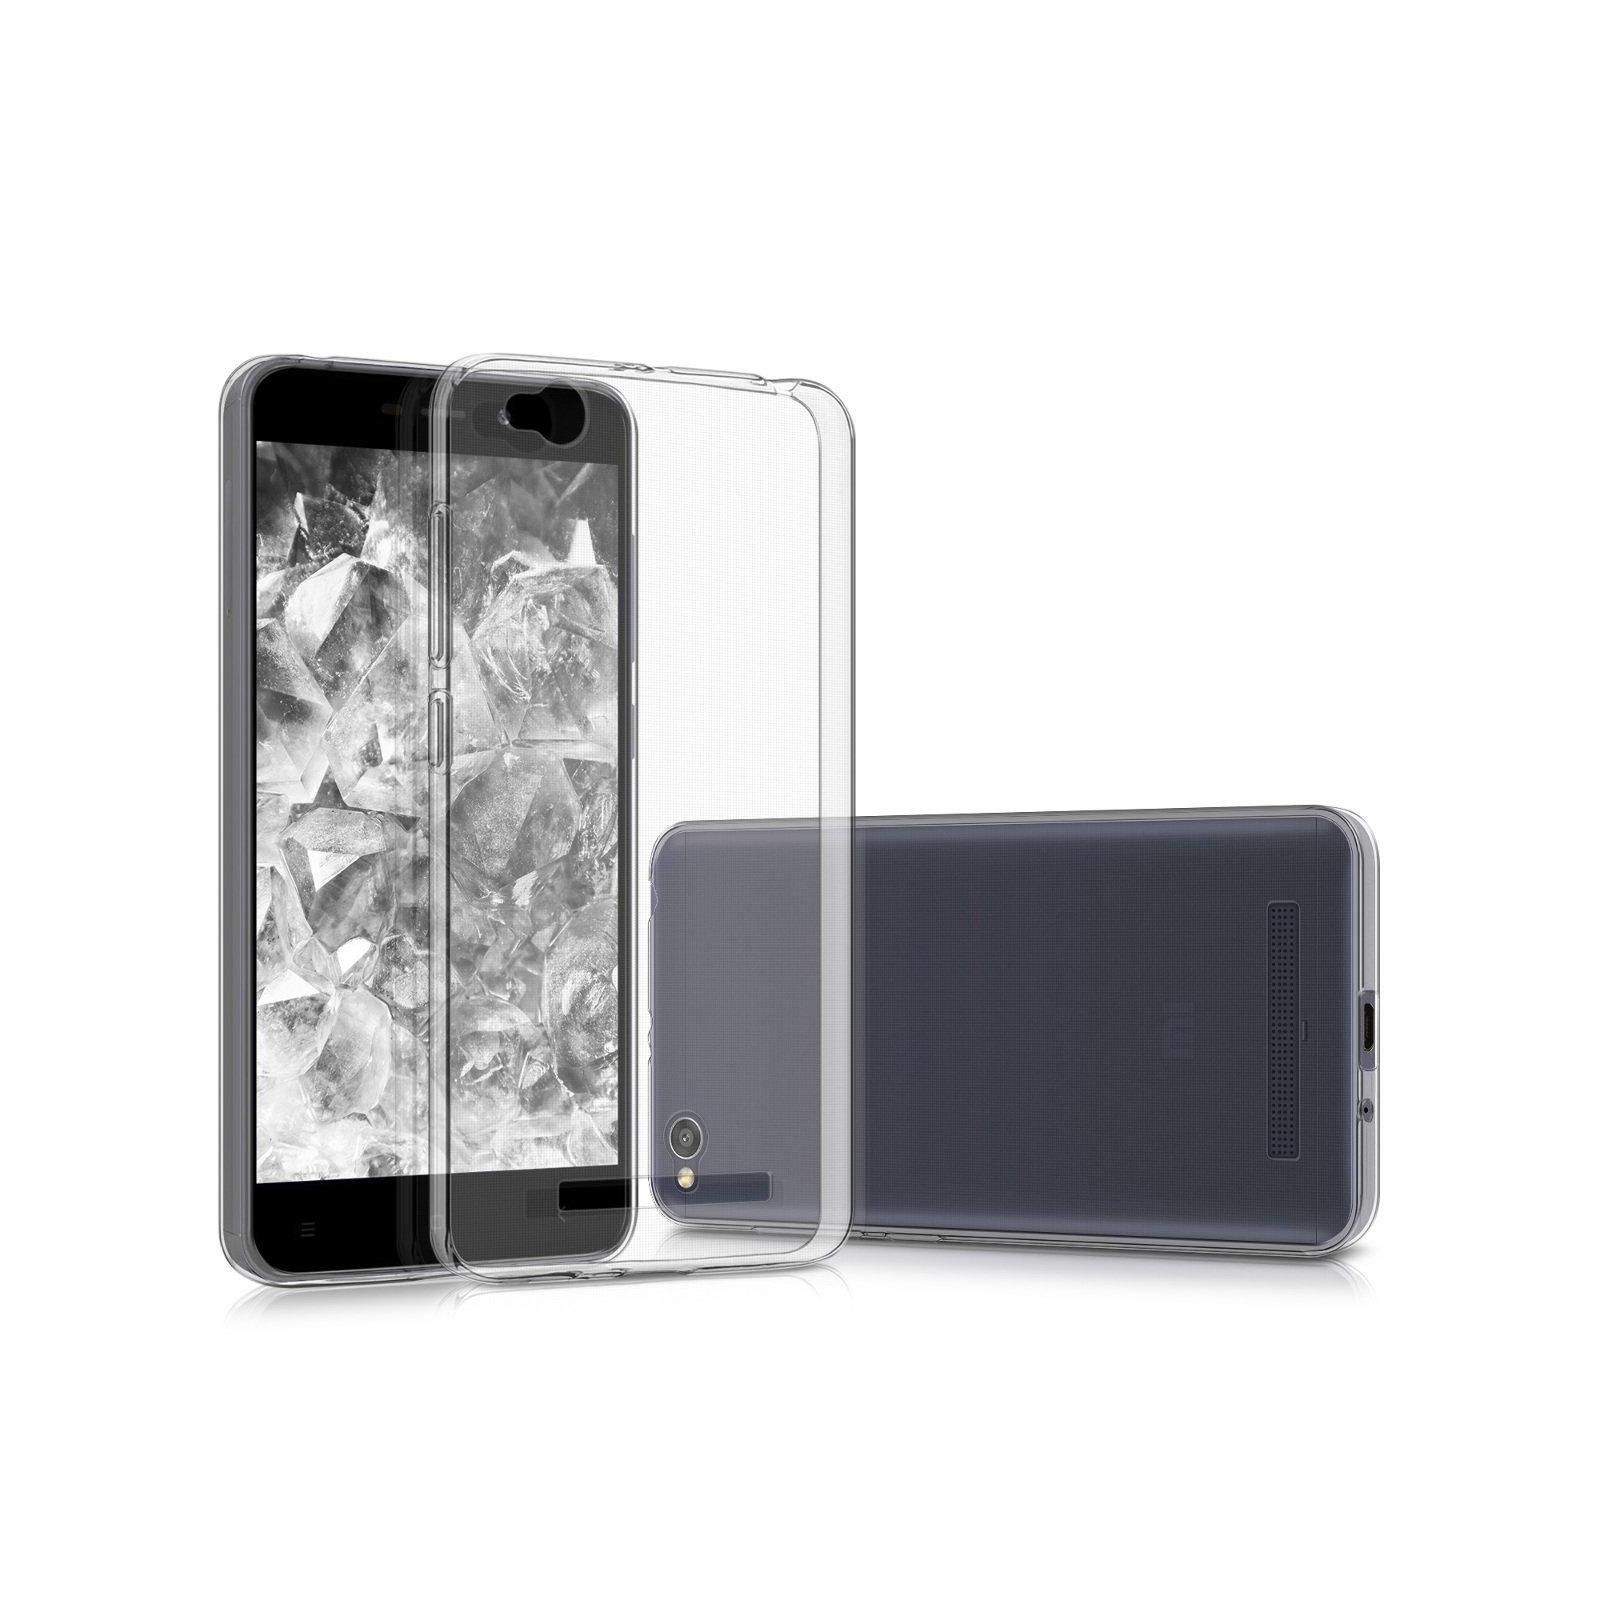 Чехол для моб. телефона Laudtec для Xiaomi Redmi 5A Clear tpu (Transperent) (LC-XR5A) изображение 8